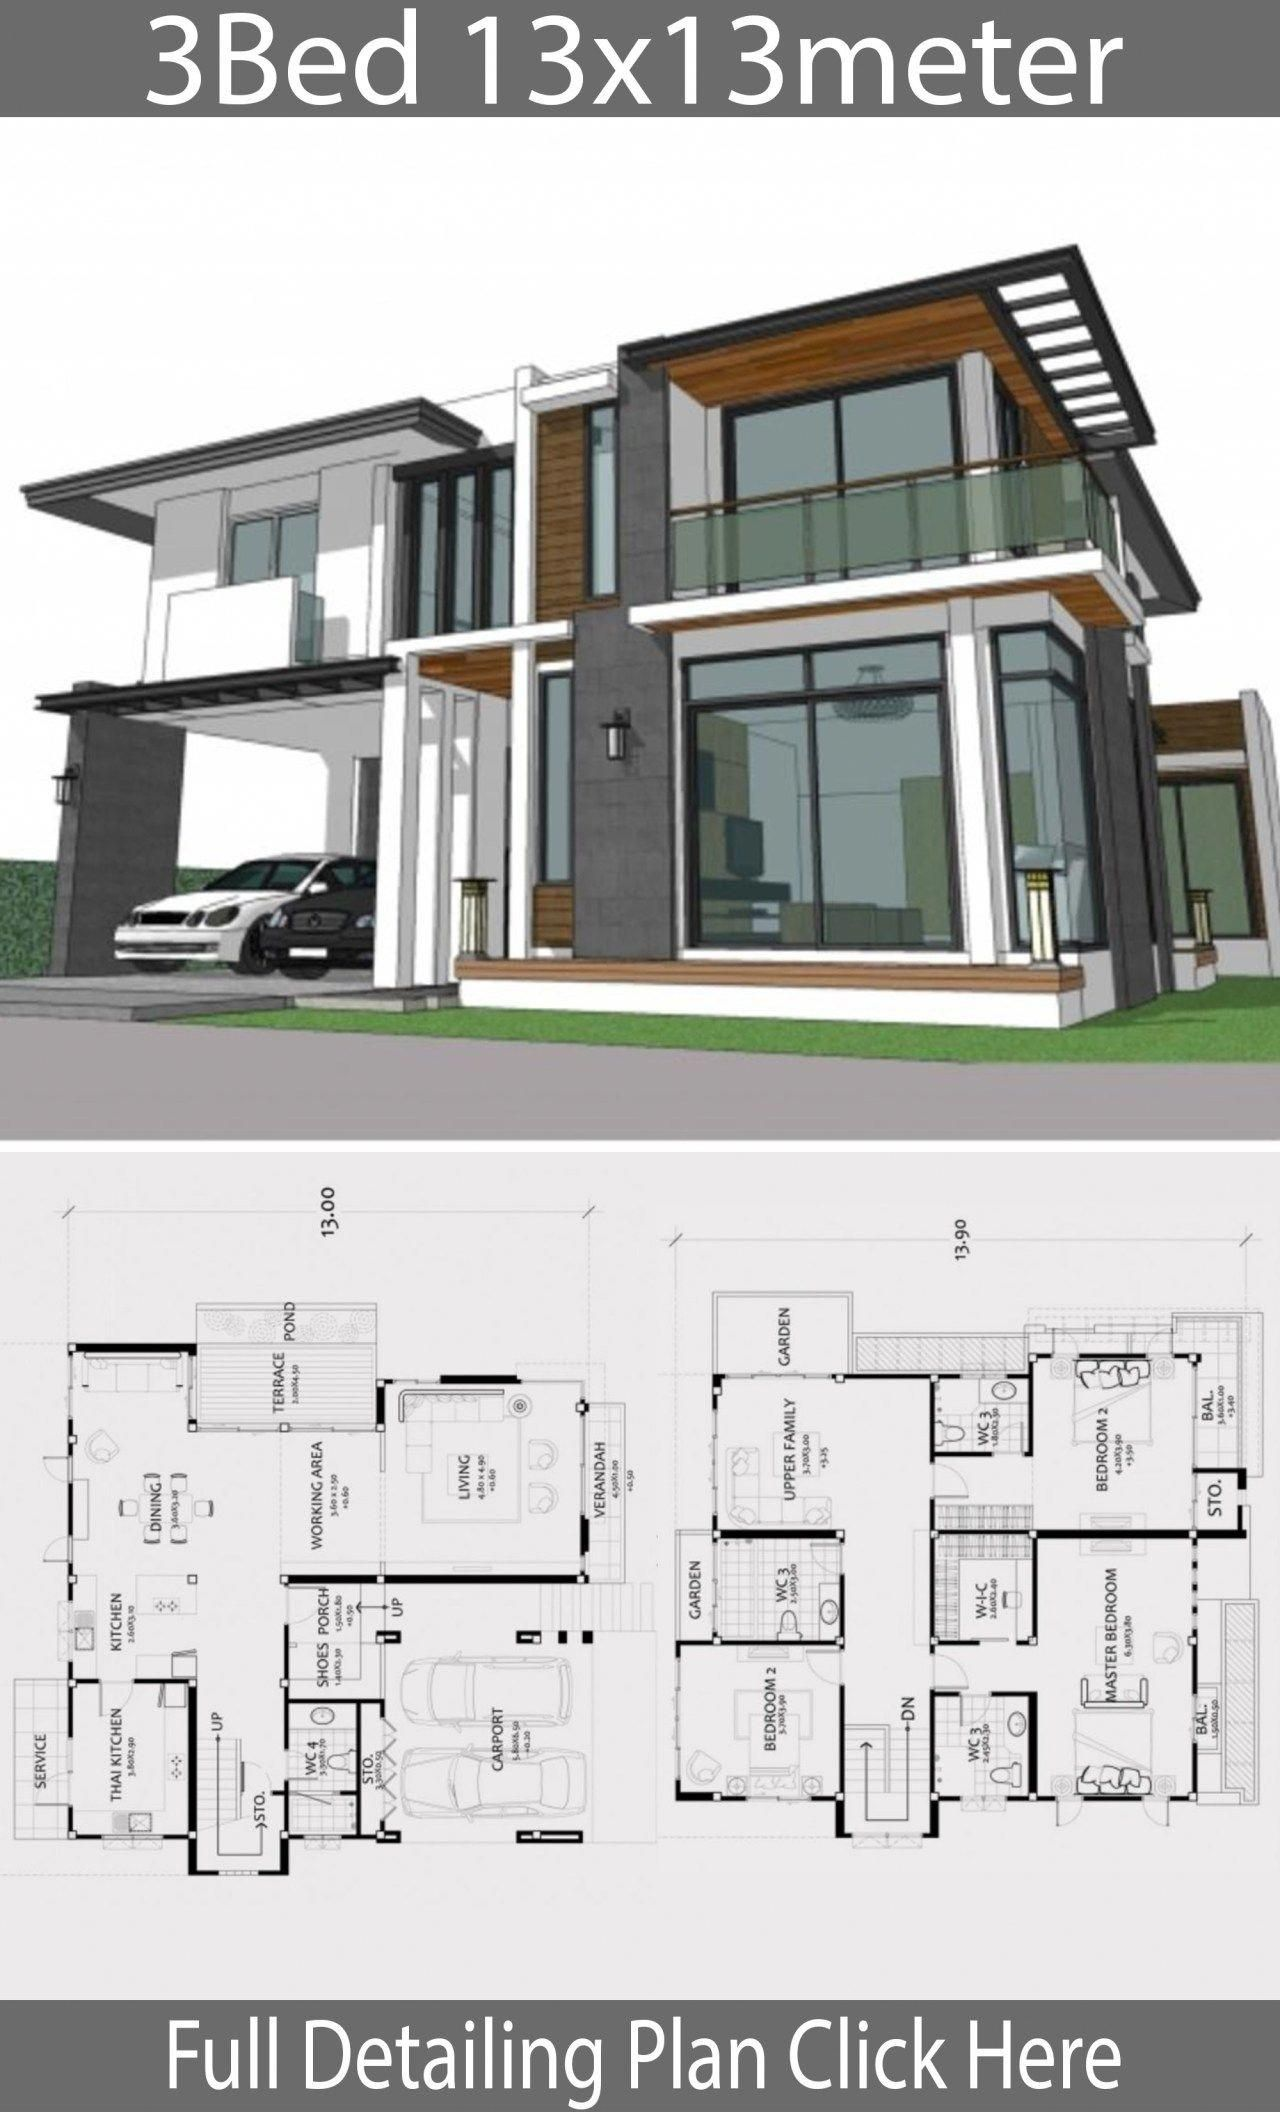 Ideal Best Living Room Bedrooms Modernhomeinteriors Architectural House Plans Home Design Plan Home Building Design